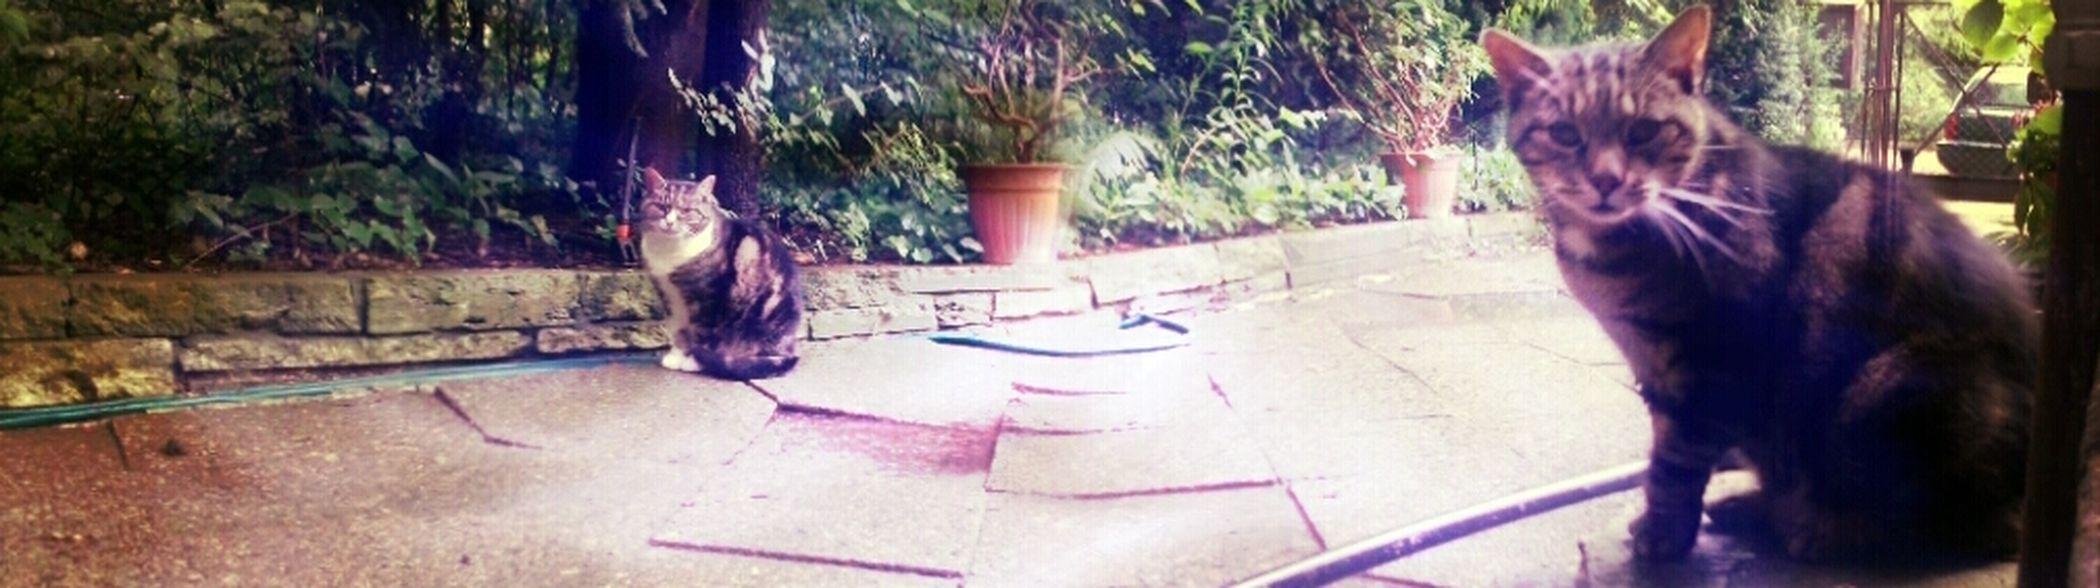 Cats Of EyeEm Aristocats Streetphotography Catsoneyeem